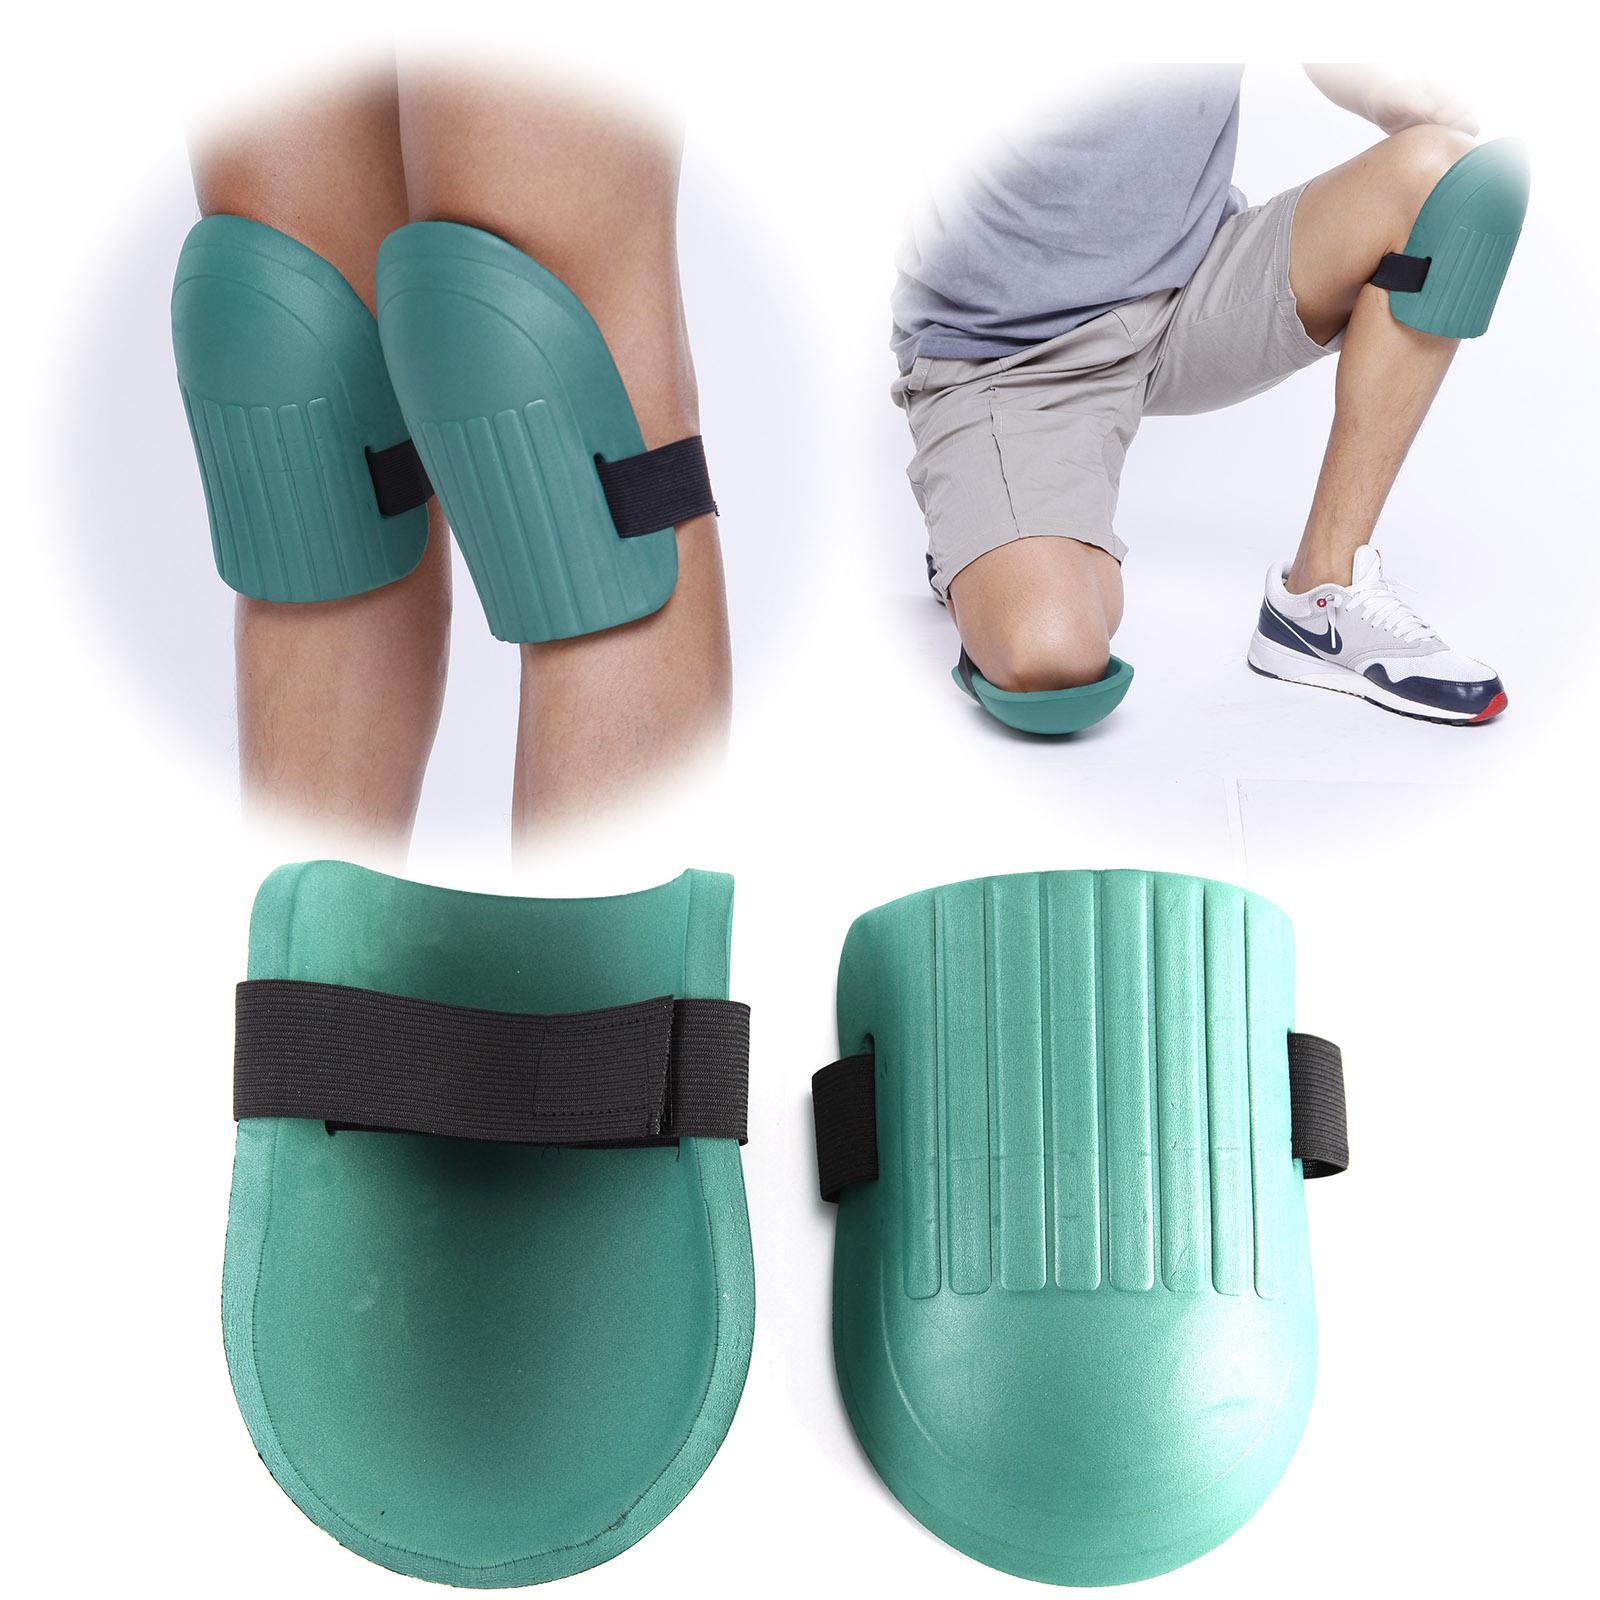 1 Pair Garden Knee Pads Flooring Soft Foam EVA Cushion Knee ...